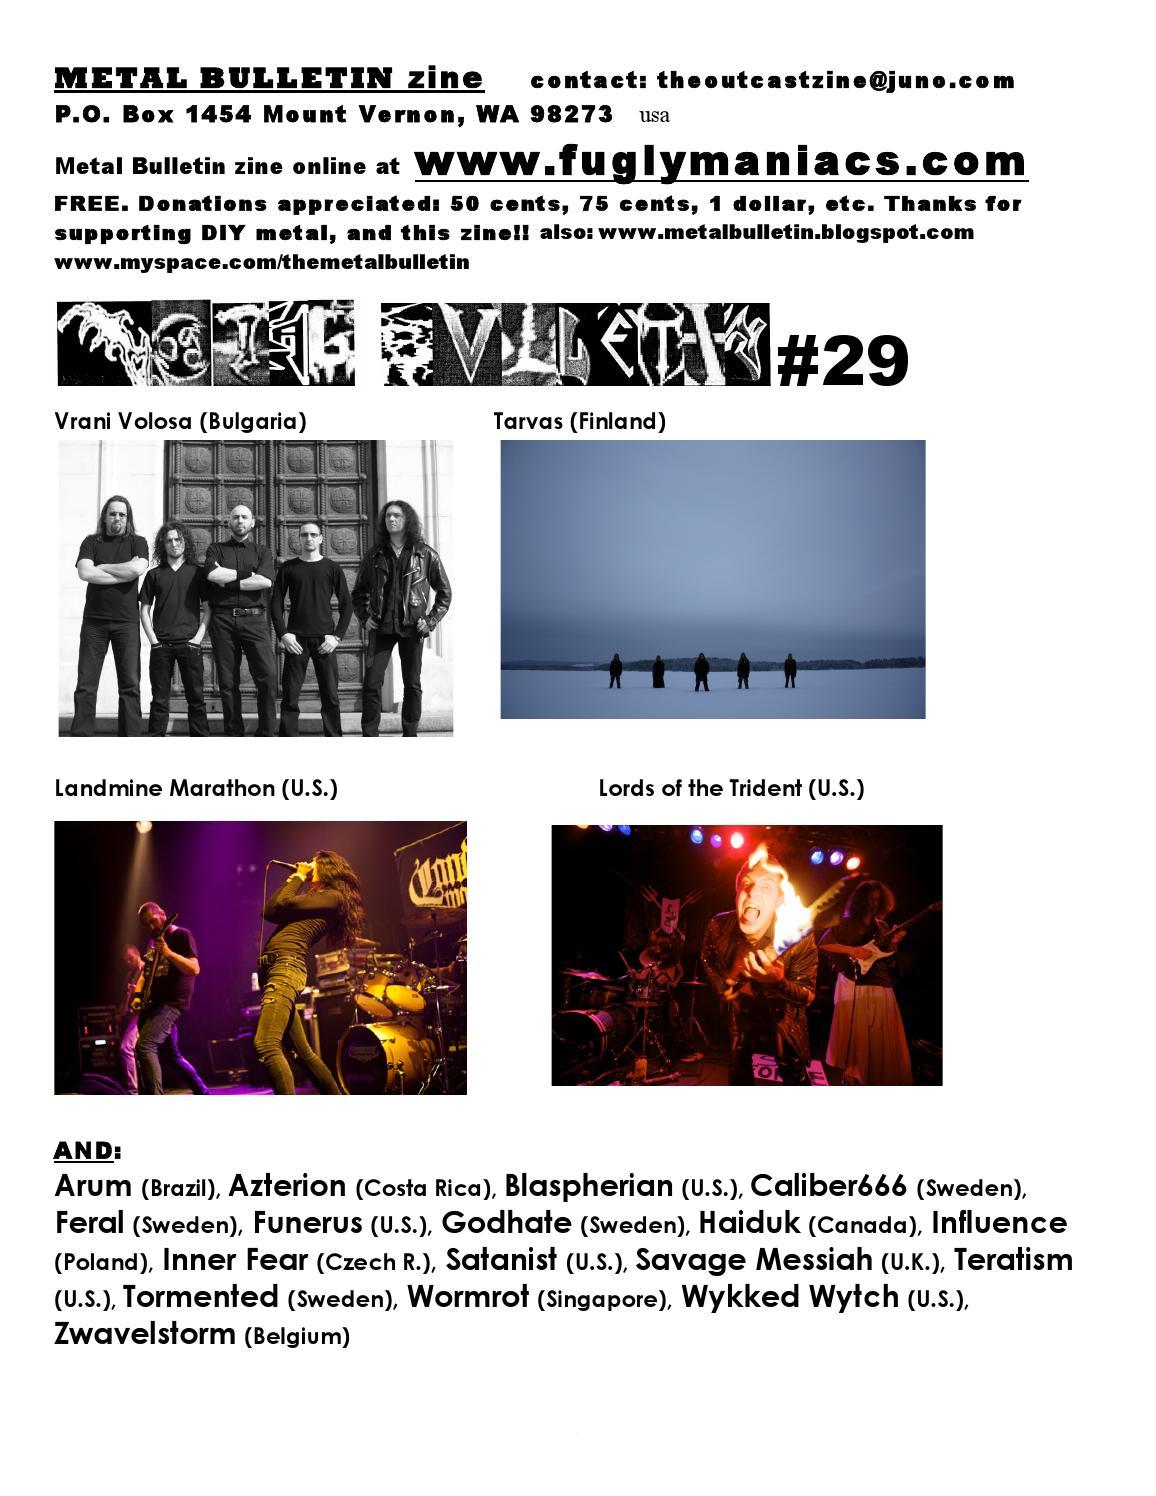 Metal Bulletin Zine 29 by Metal Bulletin Zine - issuu